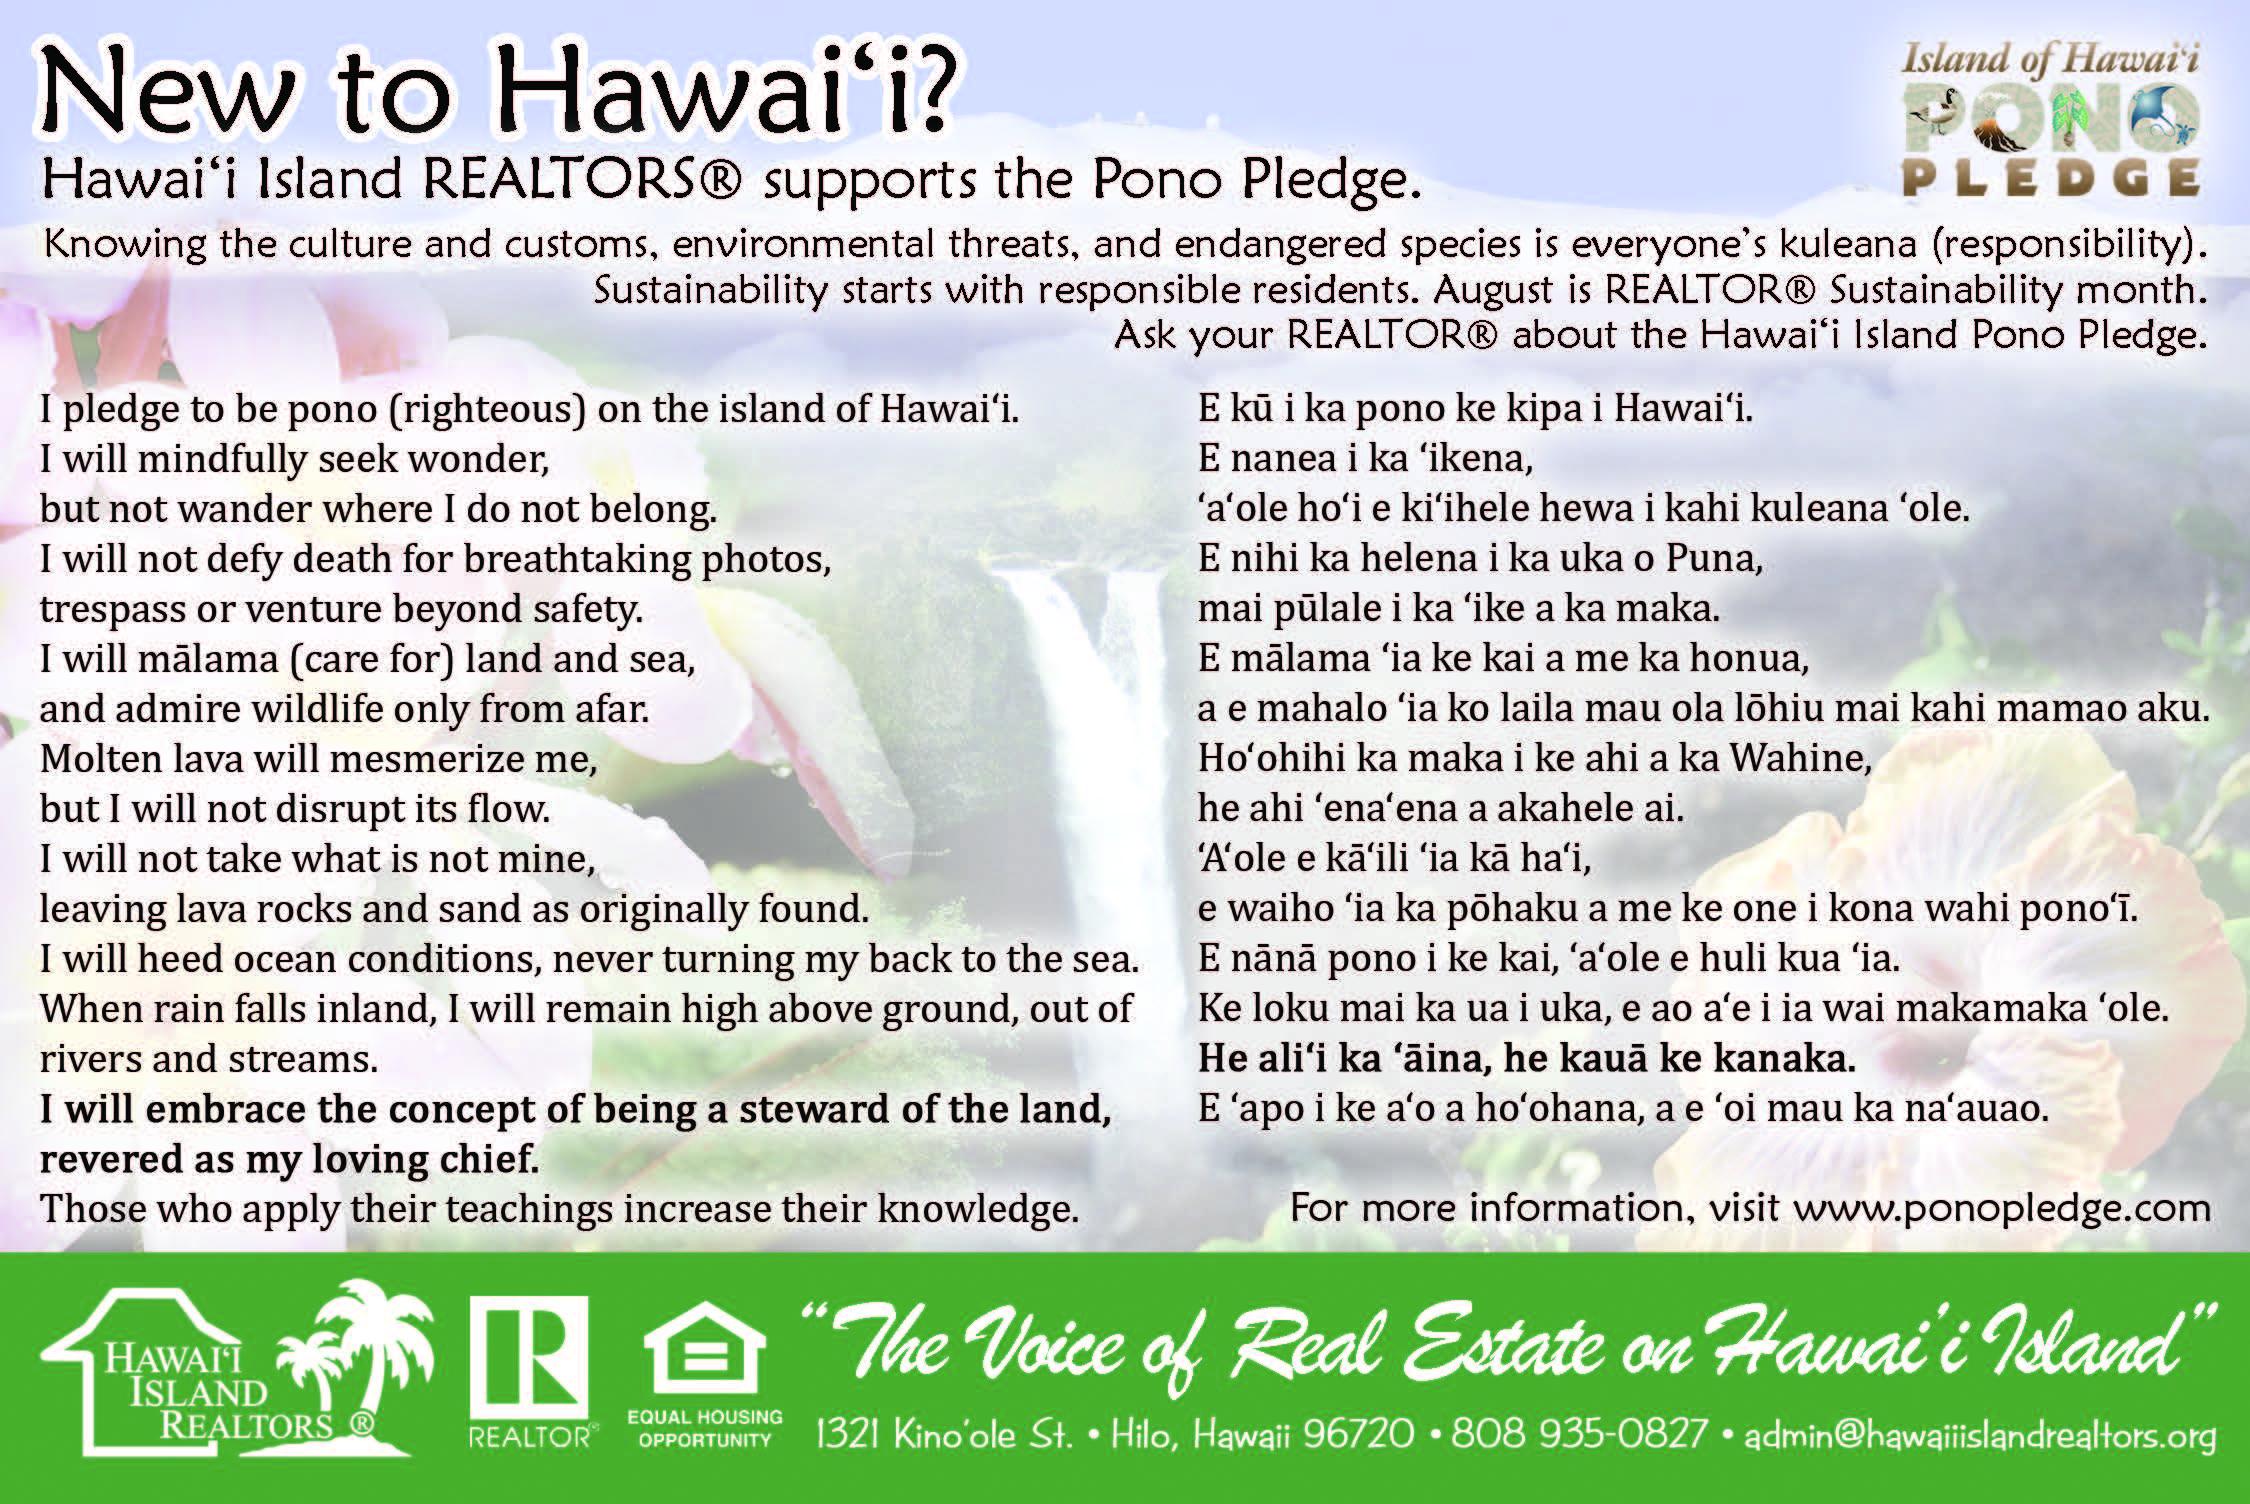 Hawai'i Island REALTORS® Supports the Pono Pledge